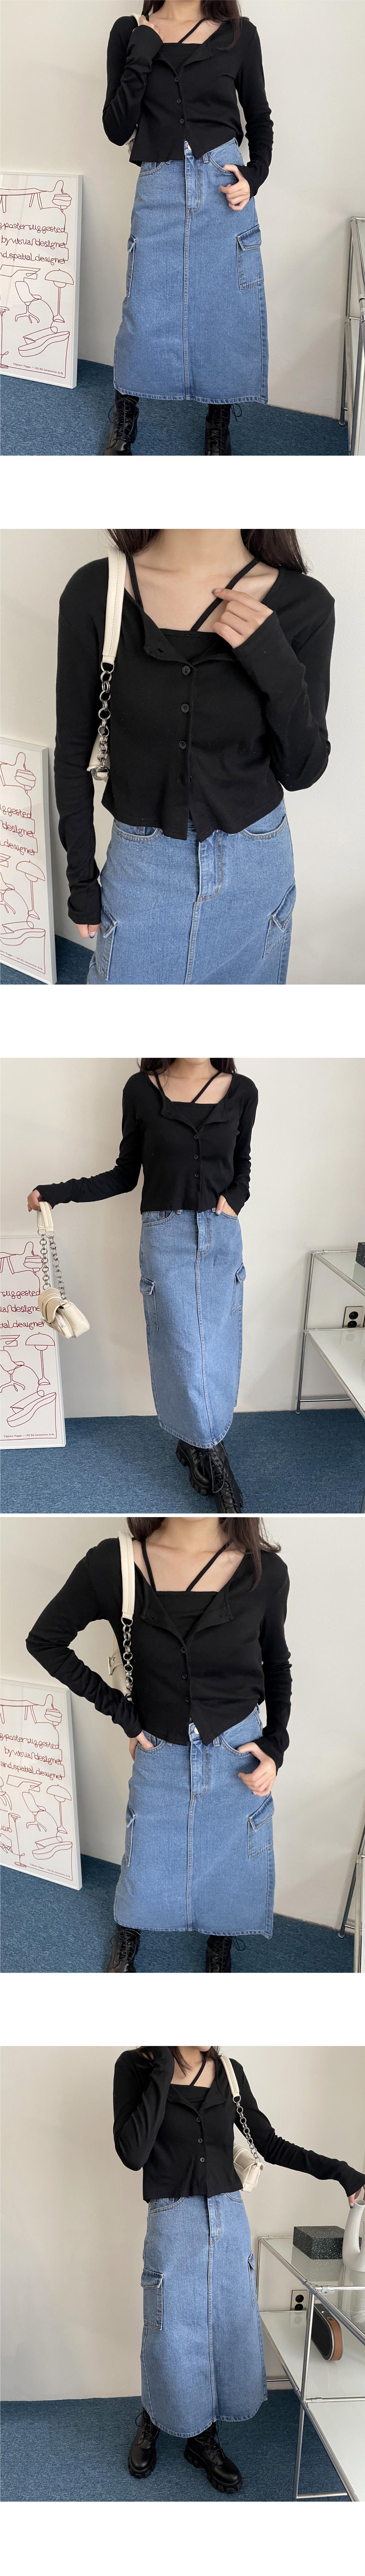 Blois Unfooted Sleeveless Cardigan Set